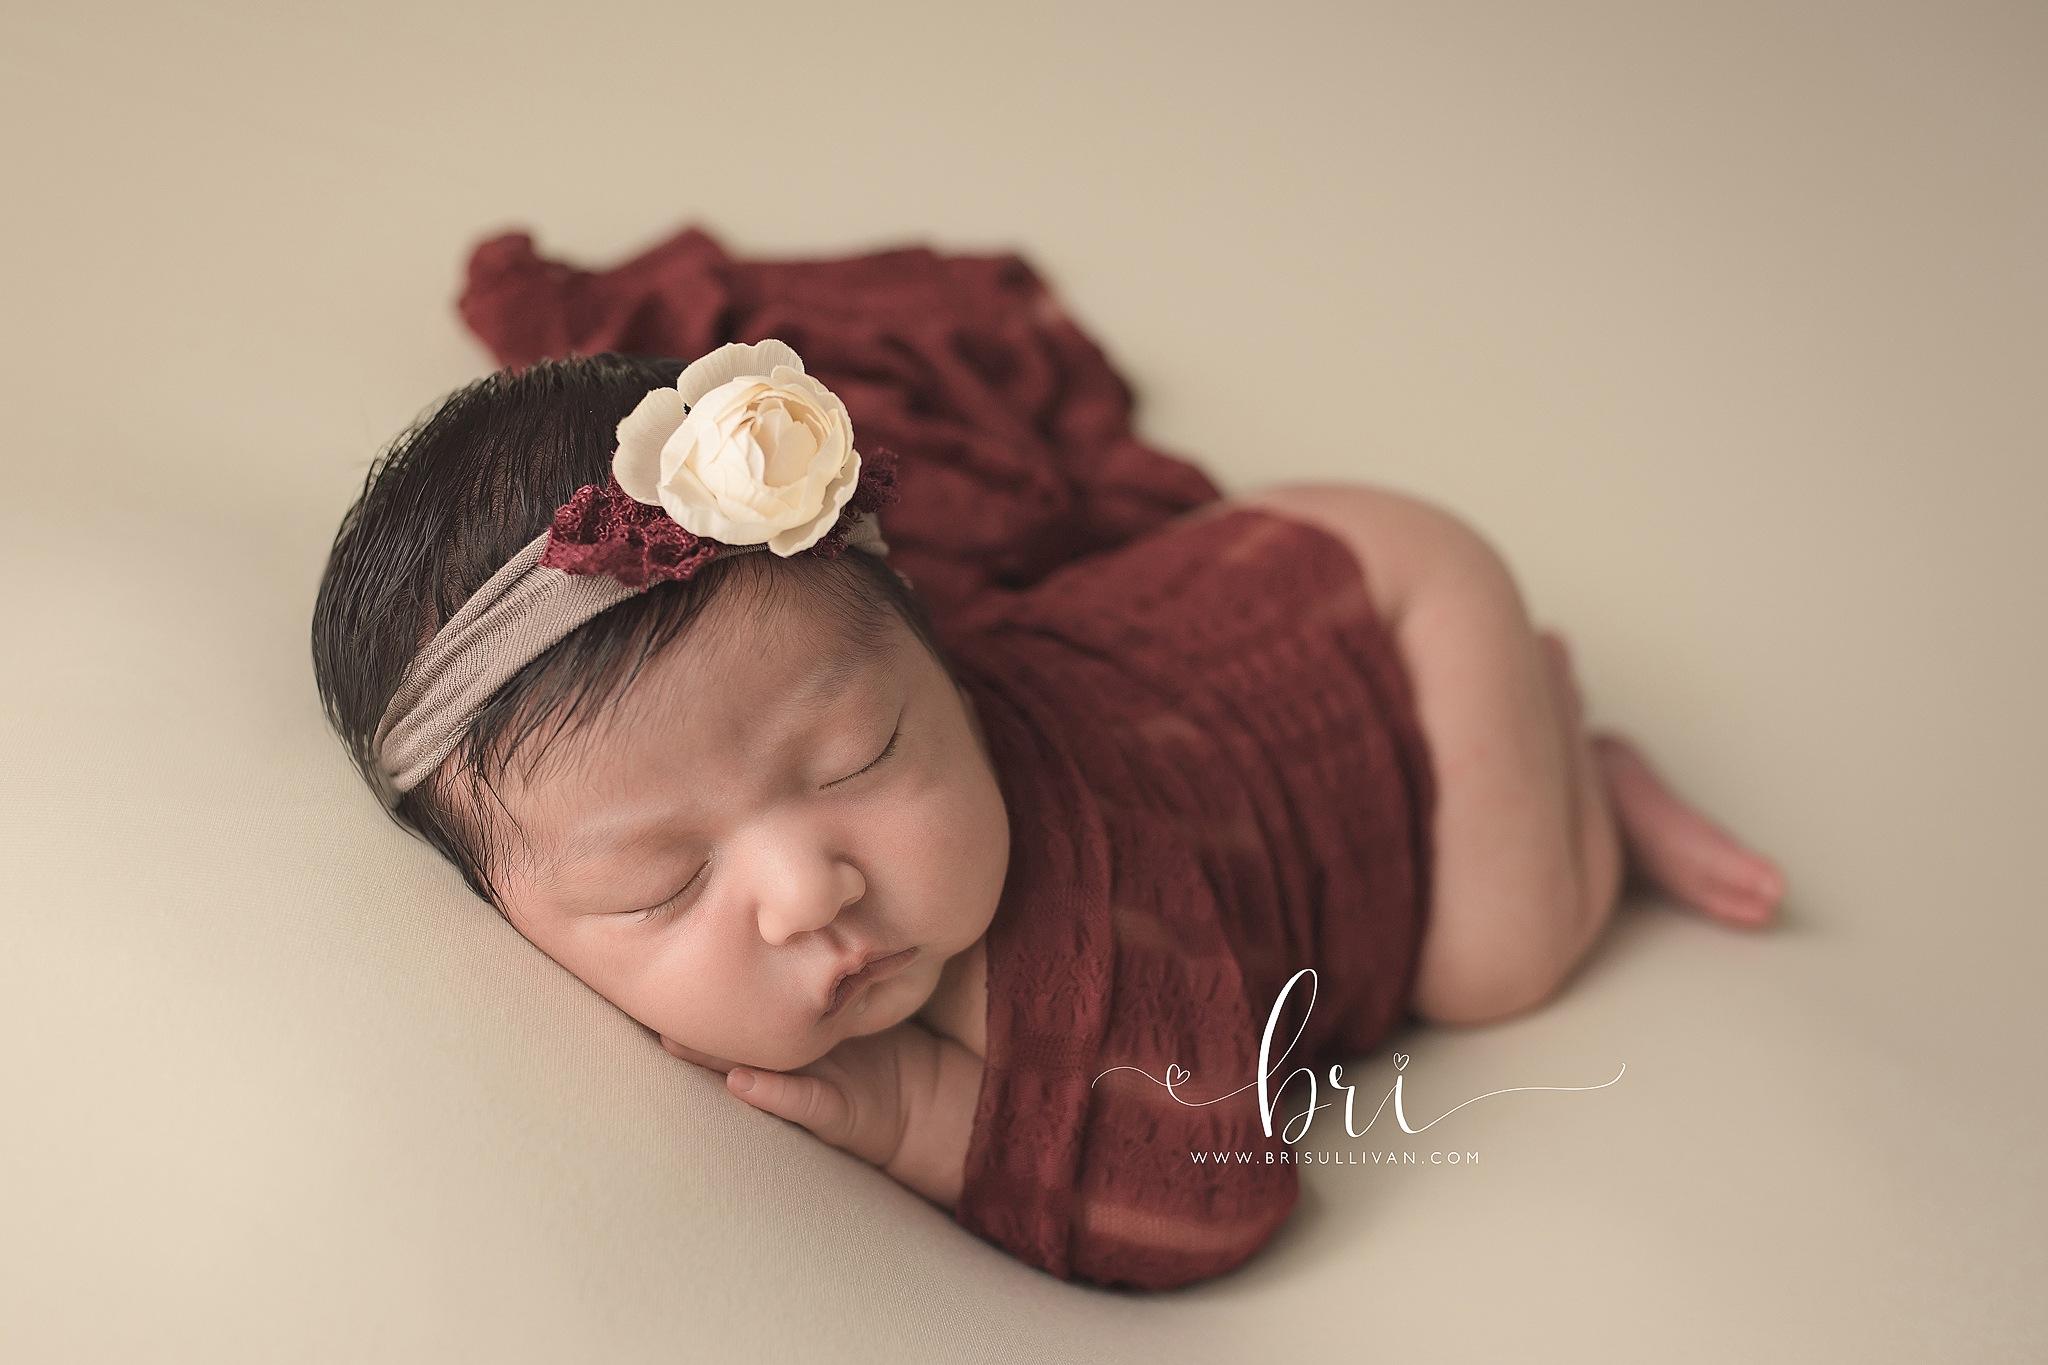 Houston Professional Newborn Photography - Bri Sullivan by cherrystreetphoto